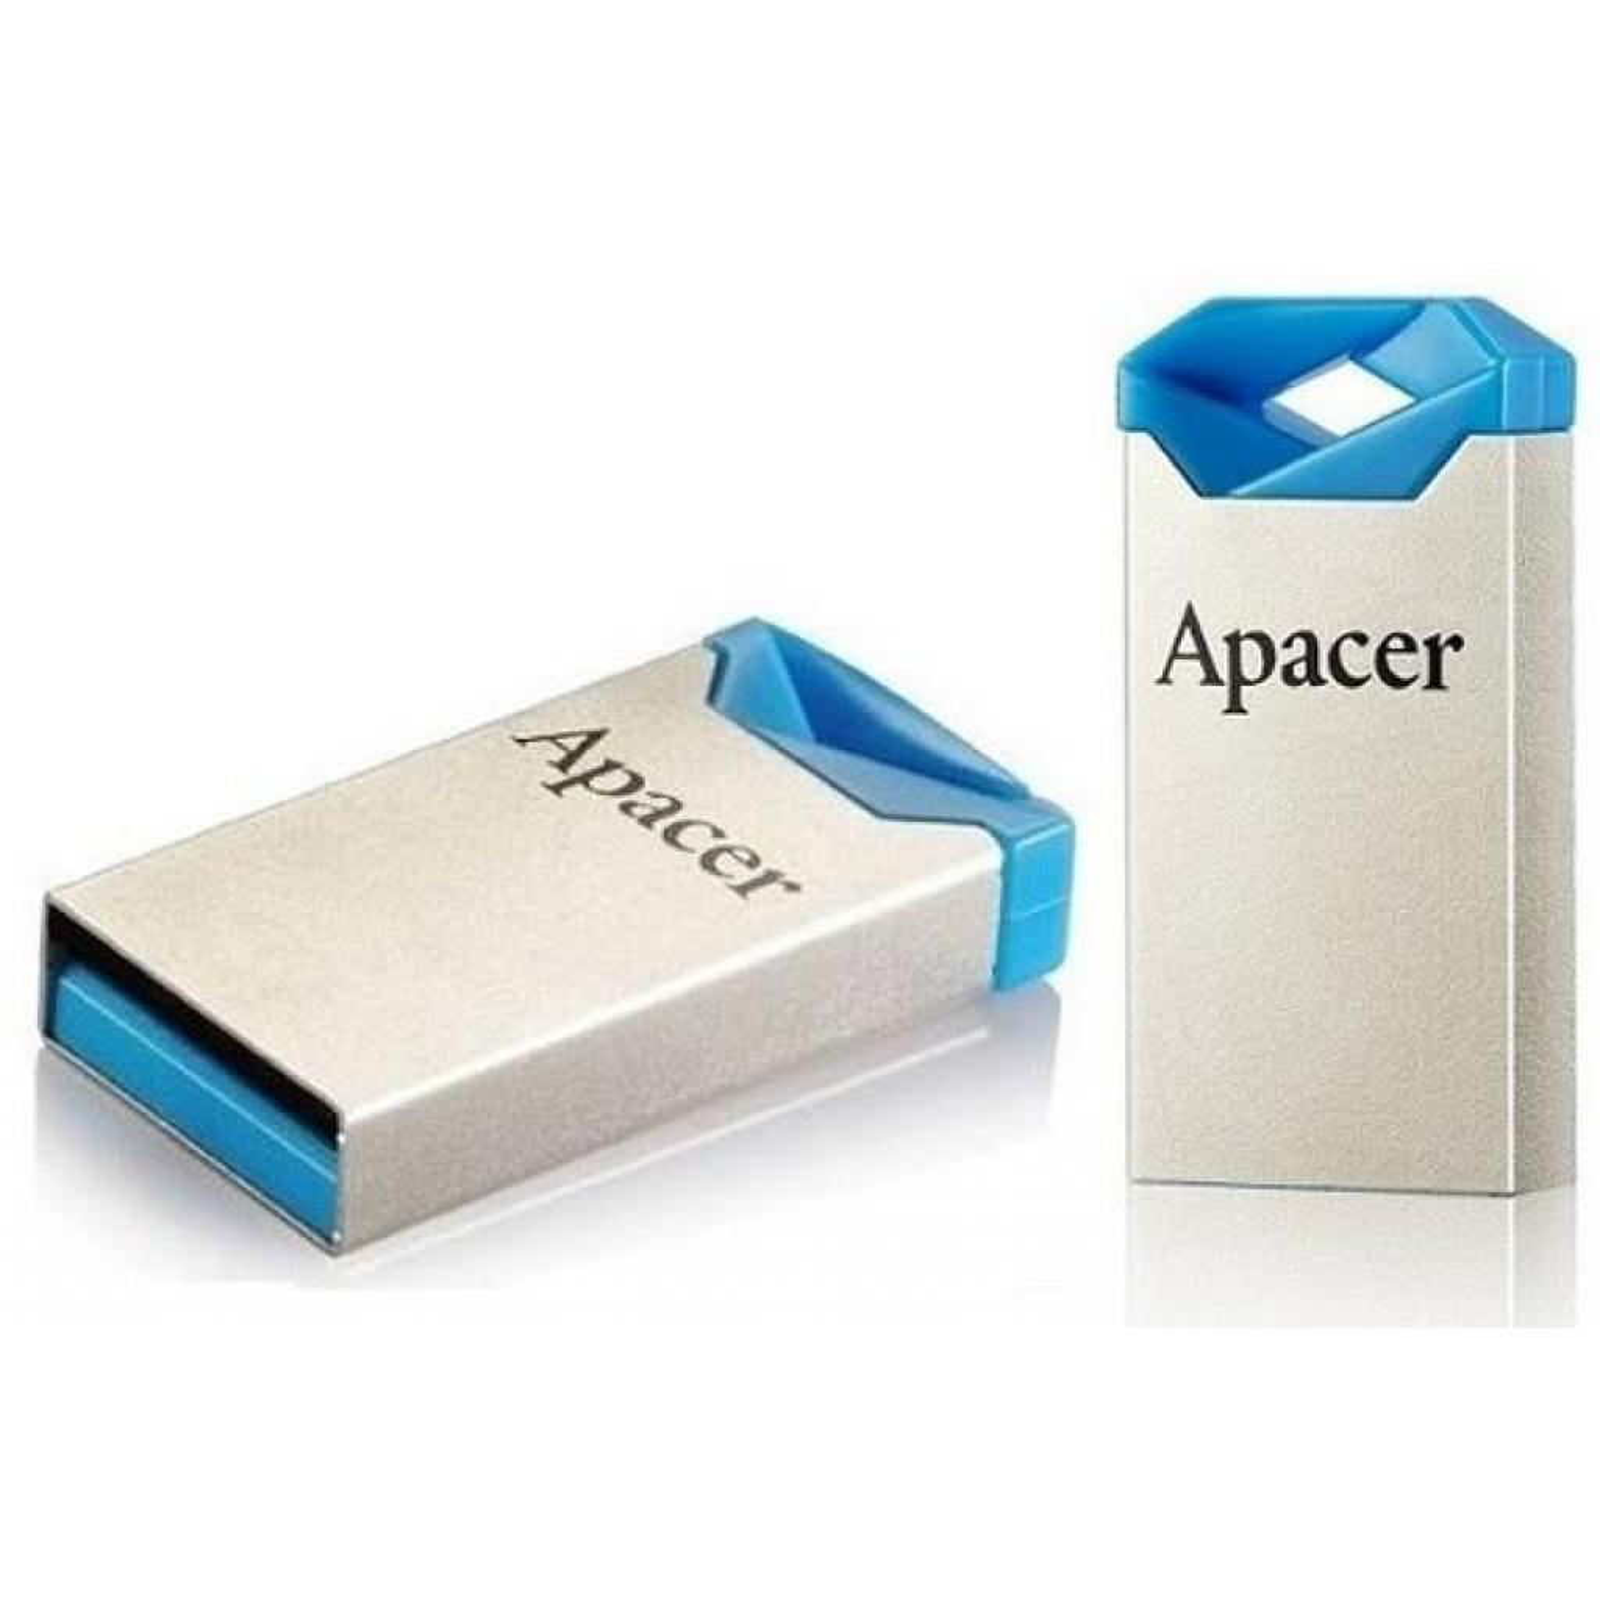 USB флеш накопитель Apacer 64GB AH111 Blue USB 2.0 (AP64GAH111U-1) изображение 4